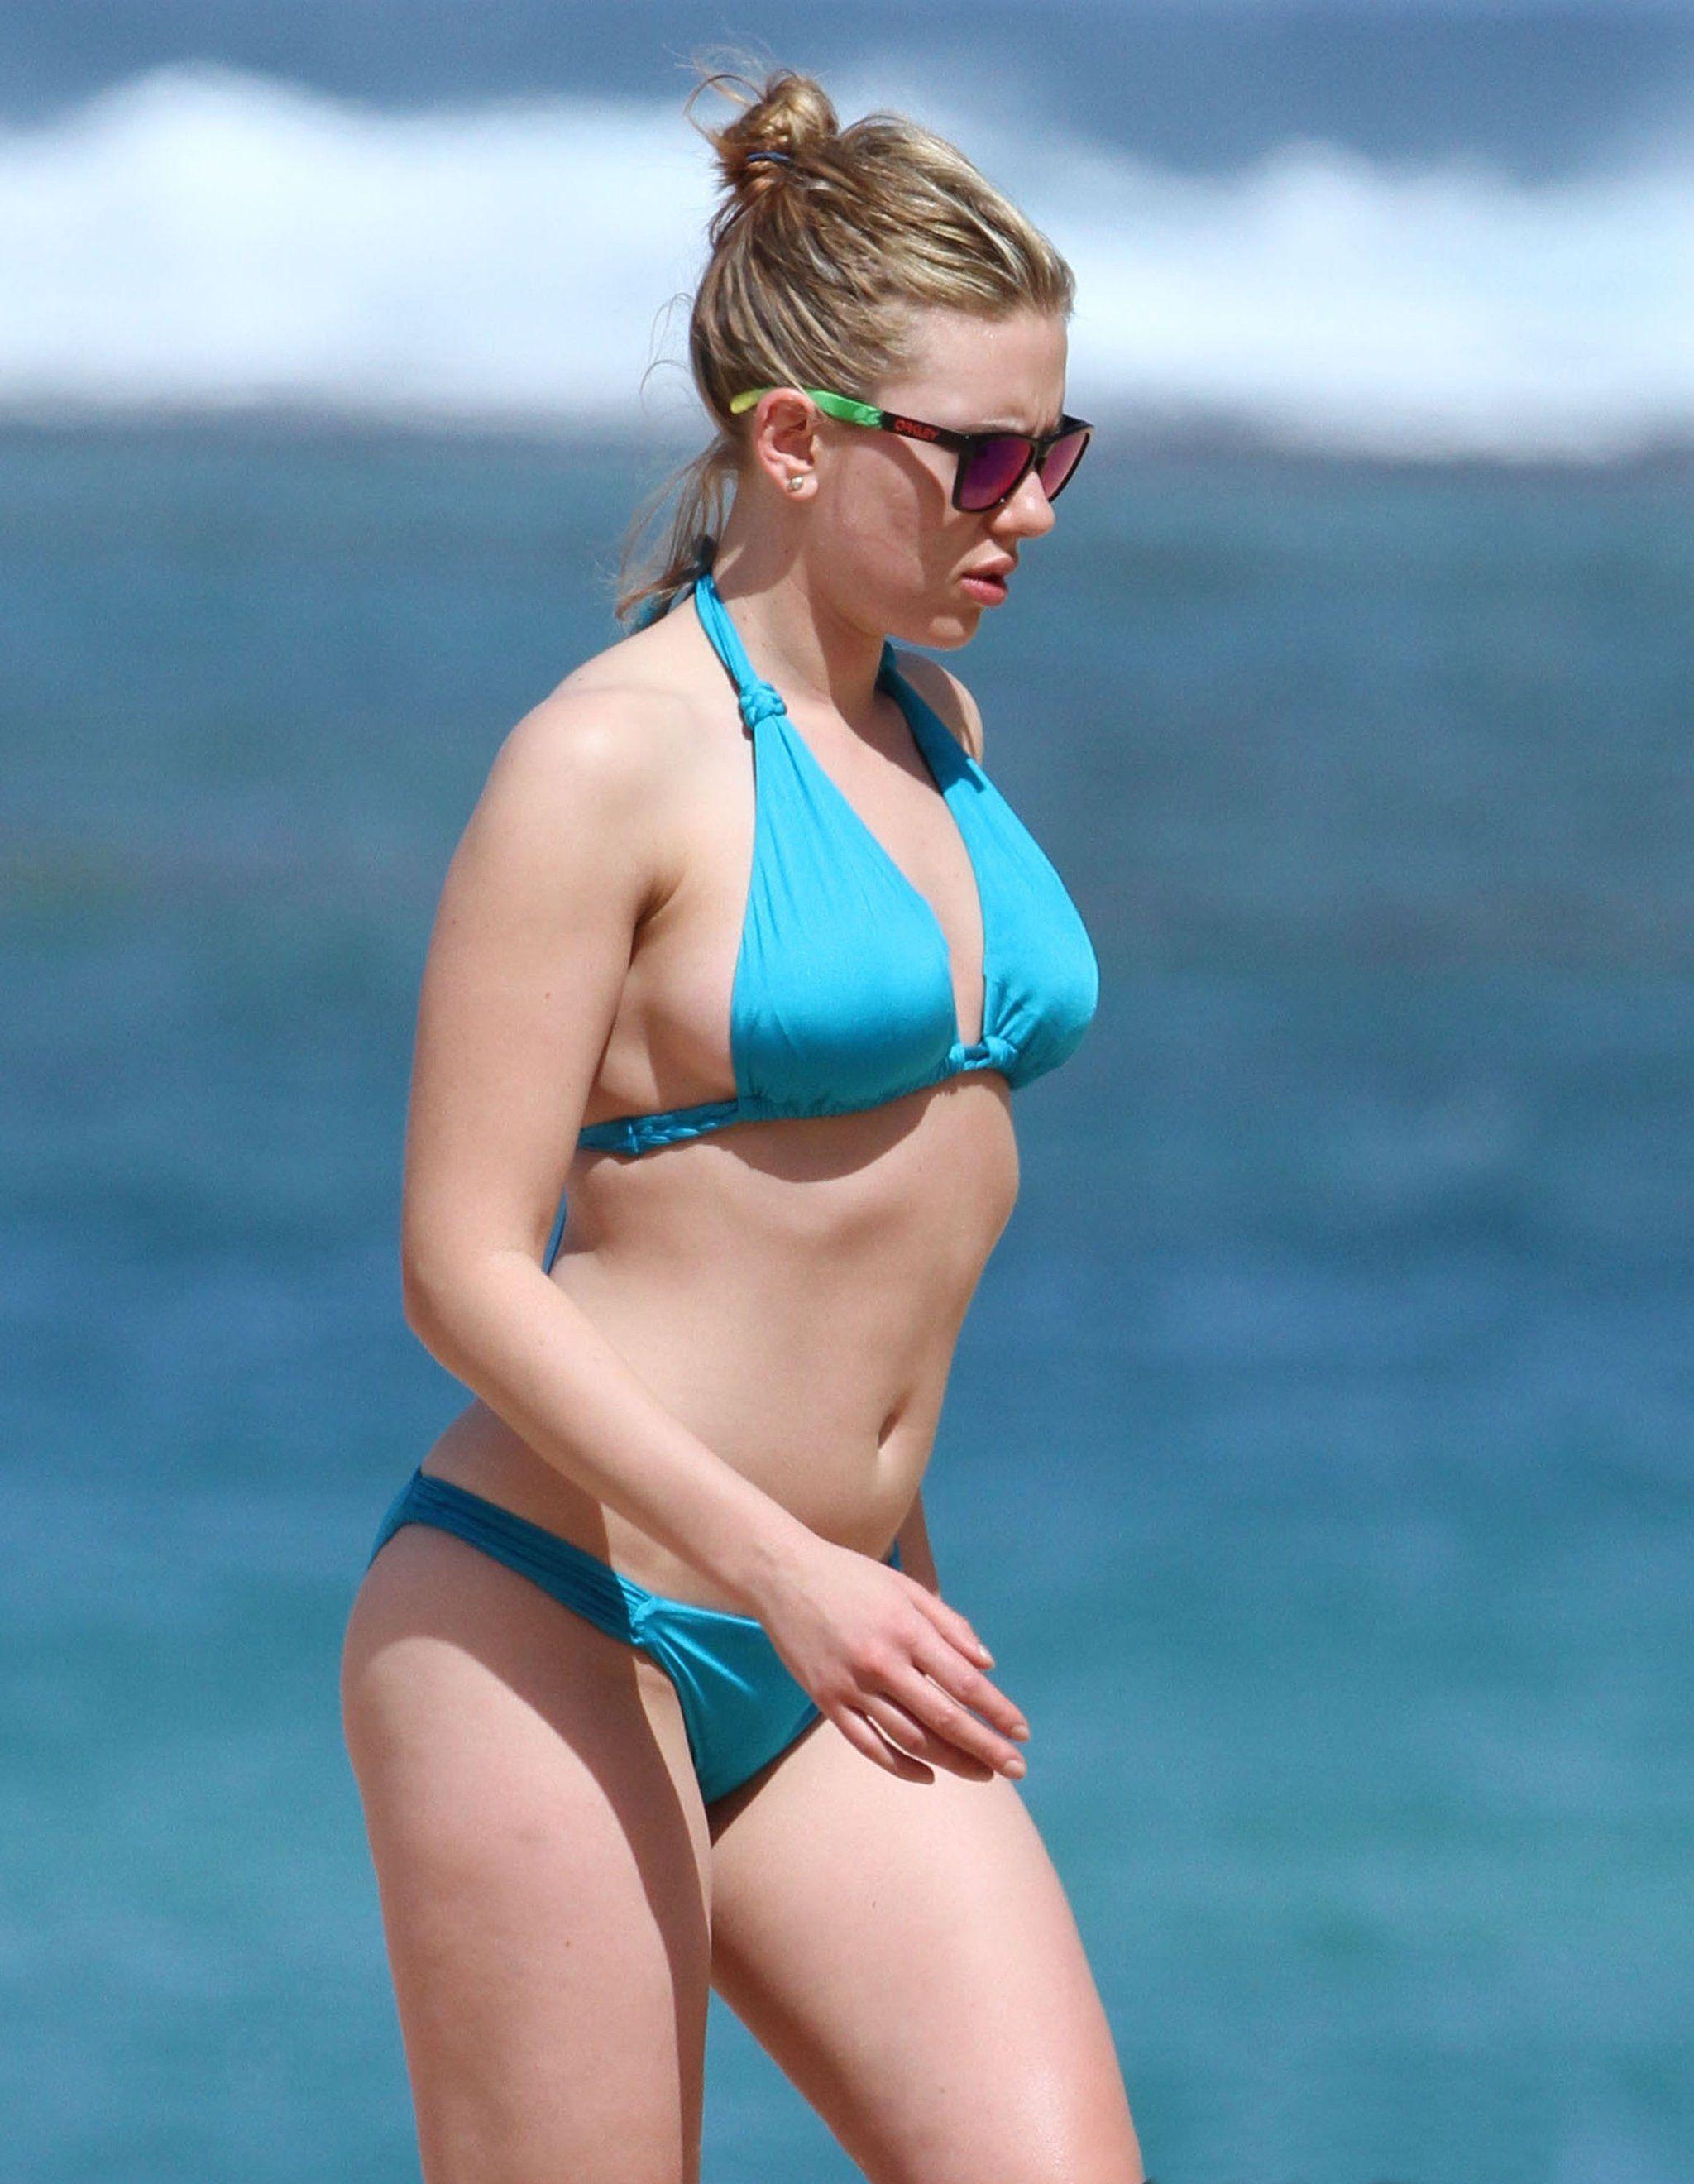 Bikiniclad scarlett johansson vacations in hawaii with her